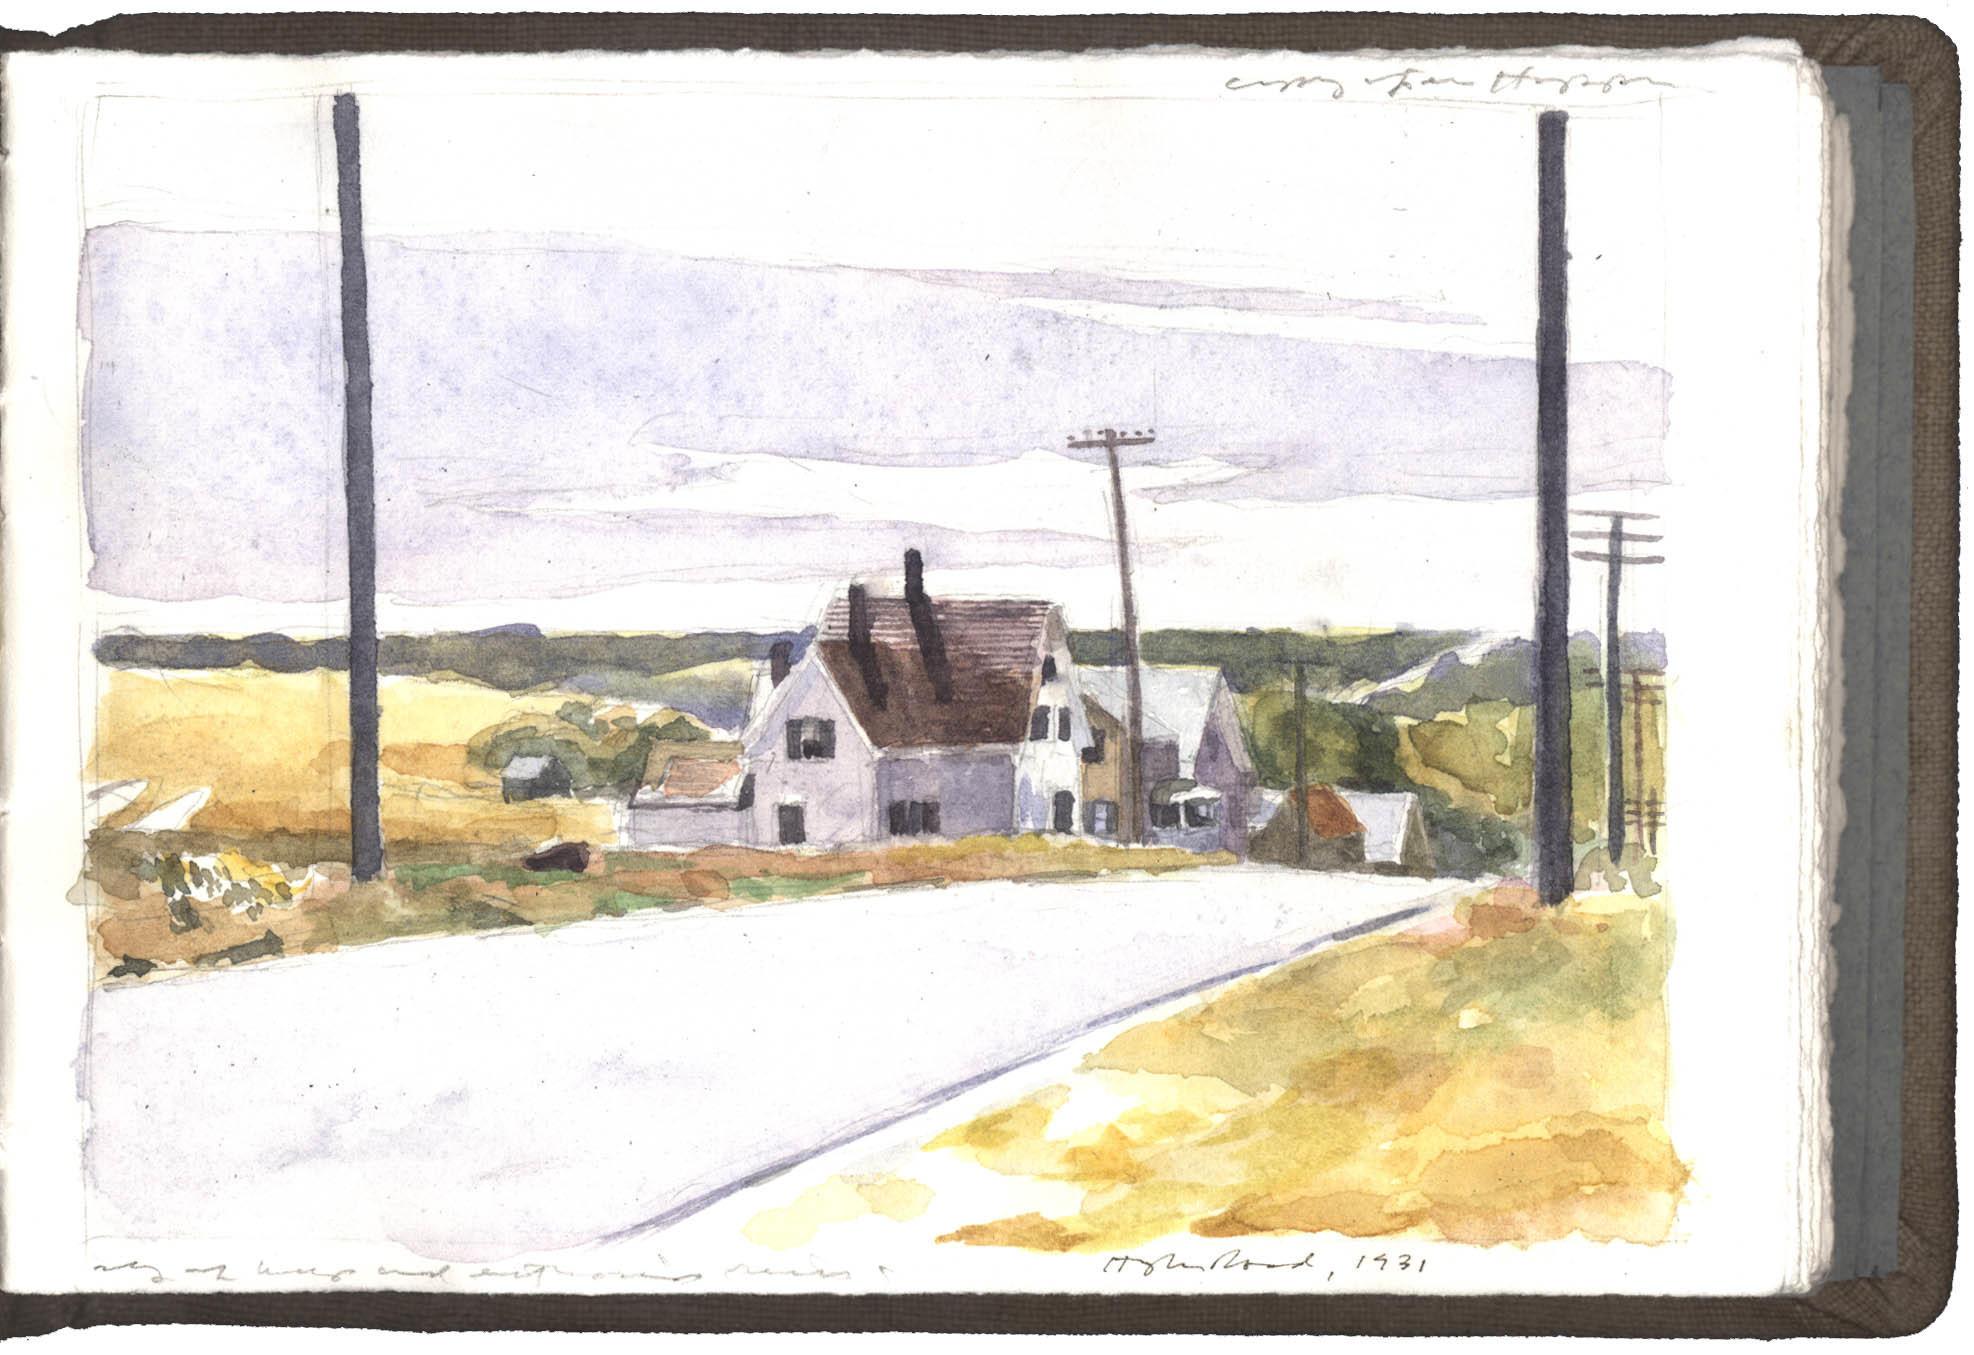 Copy after Edward Hopper watercolor image